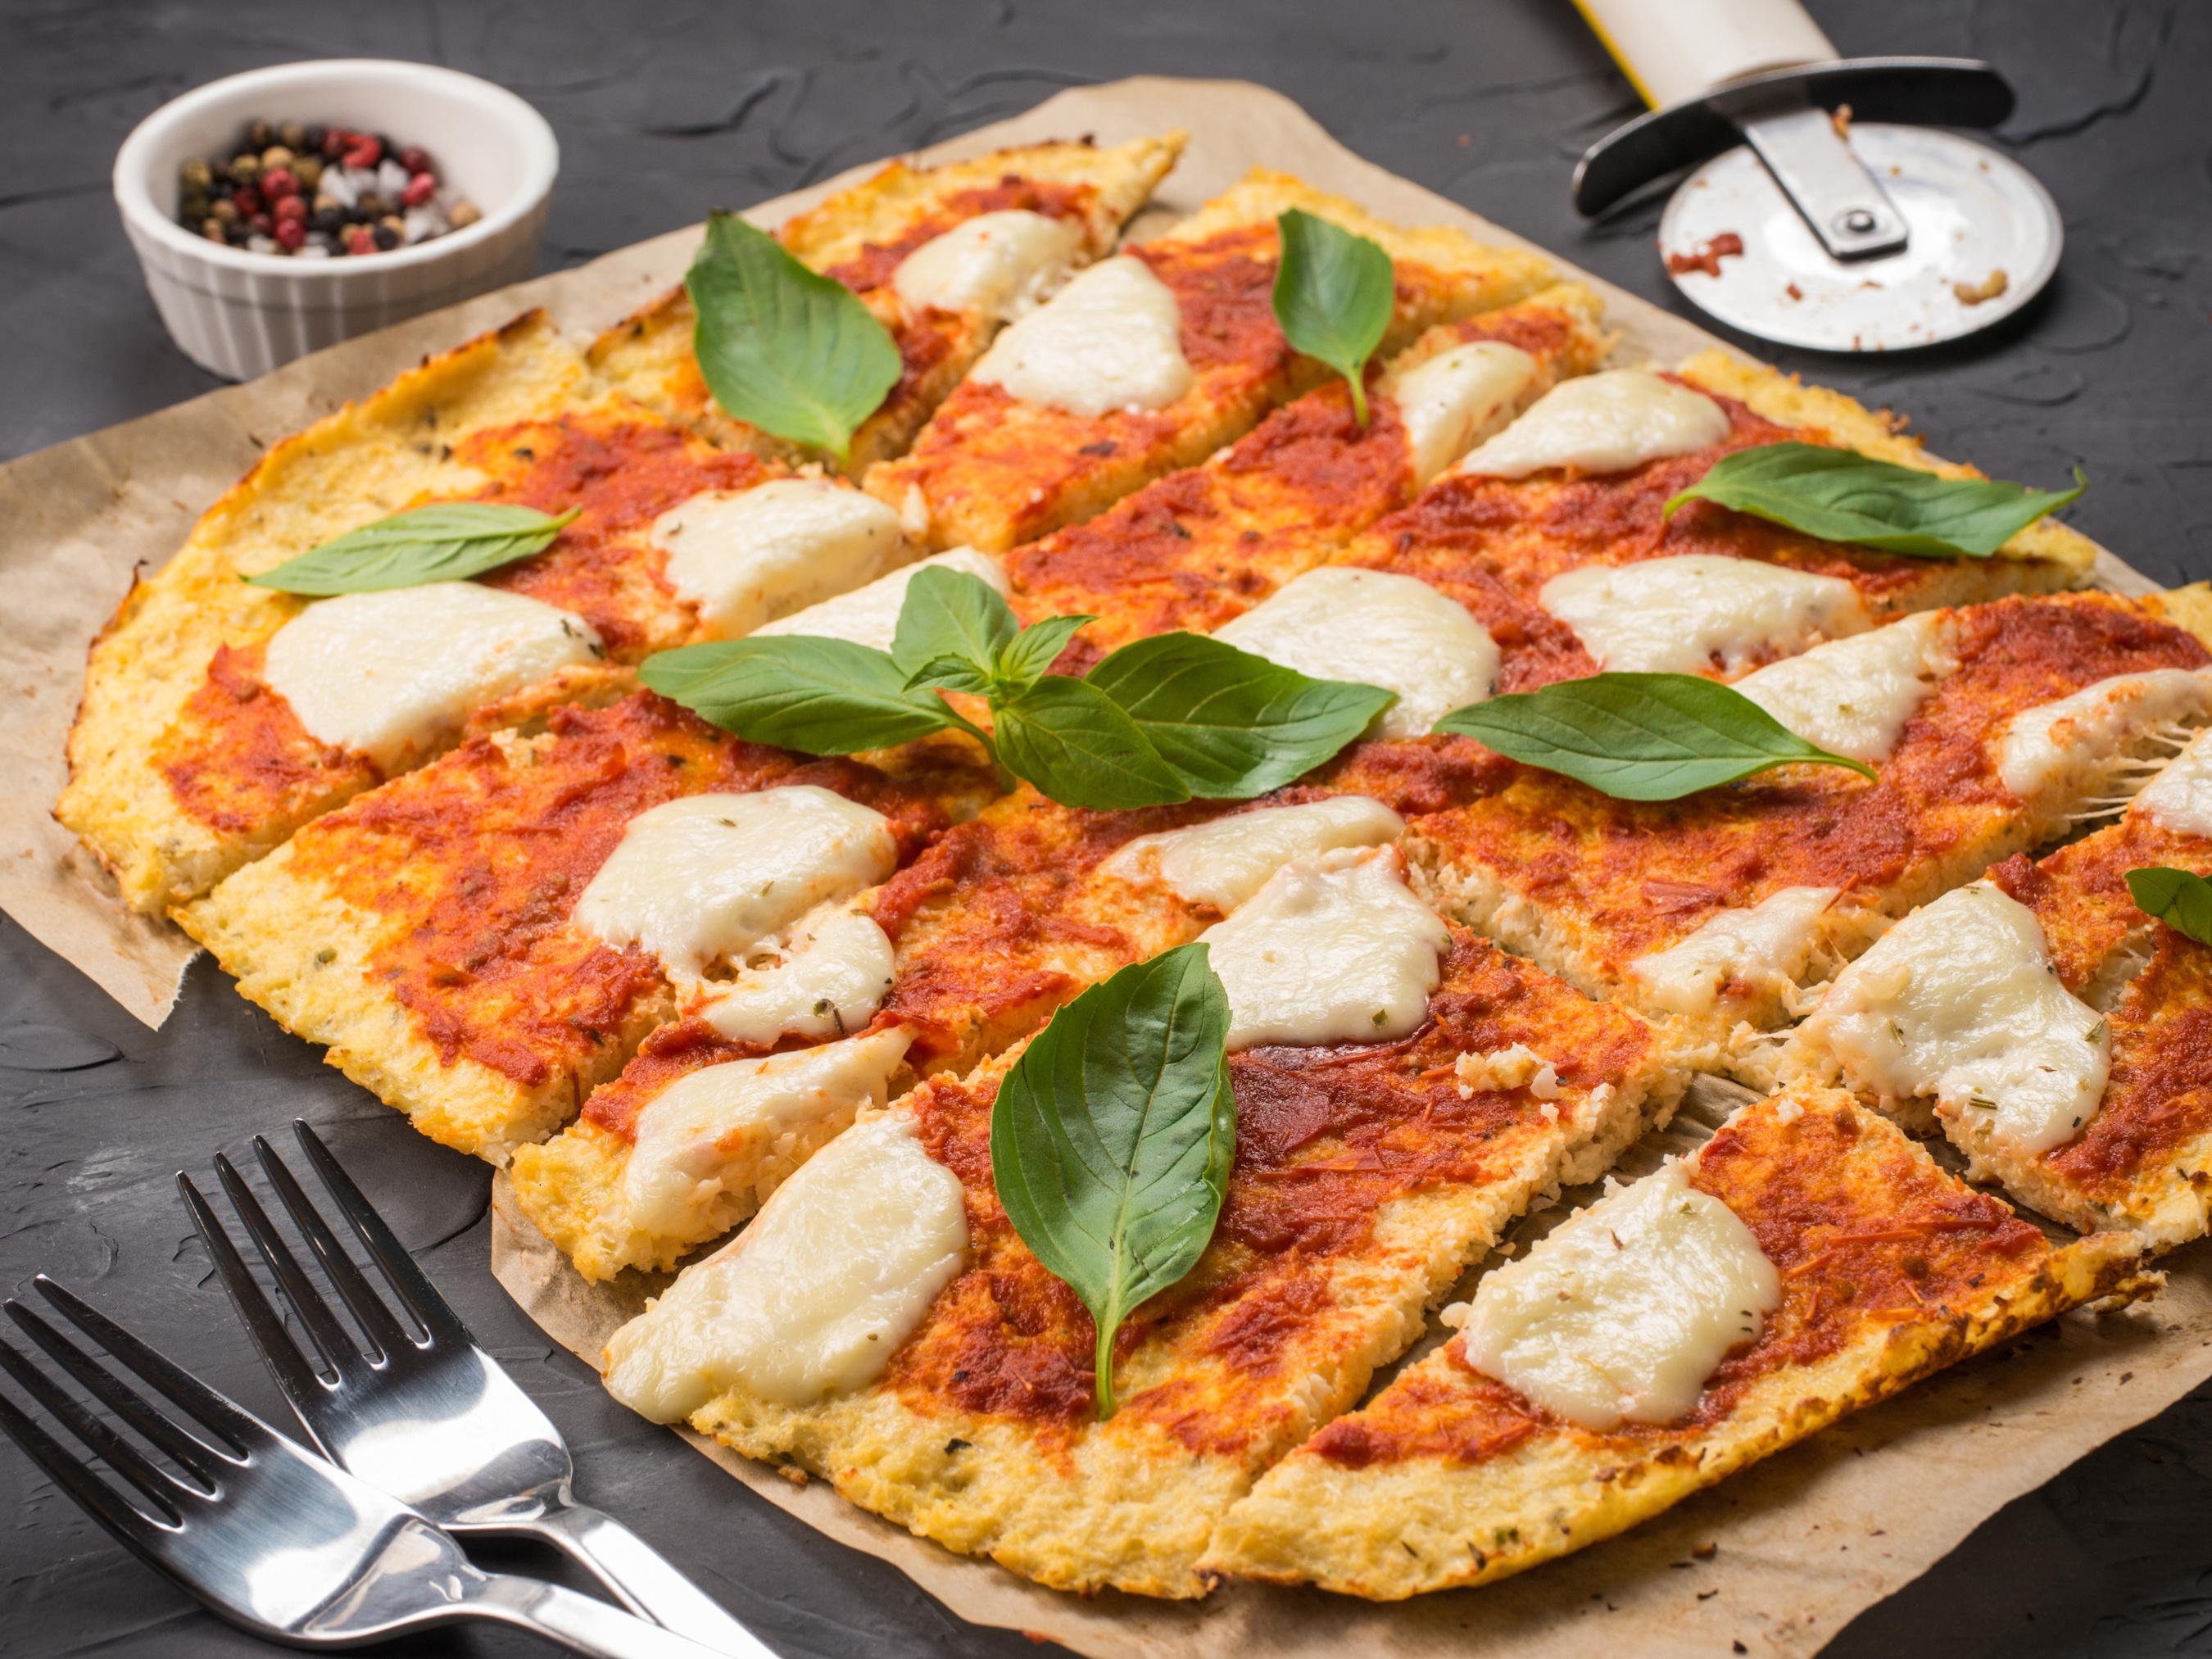 Homemade Cauliflower Pizza Crust with Mozzarella and Basil